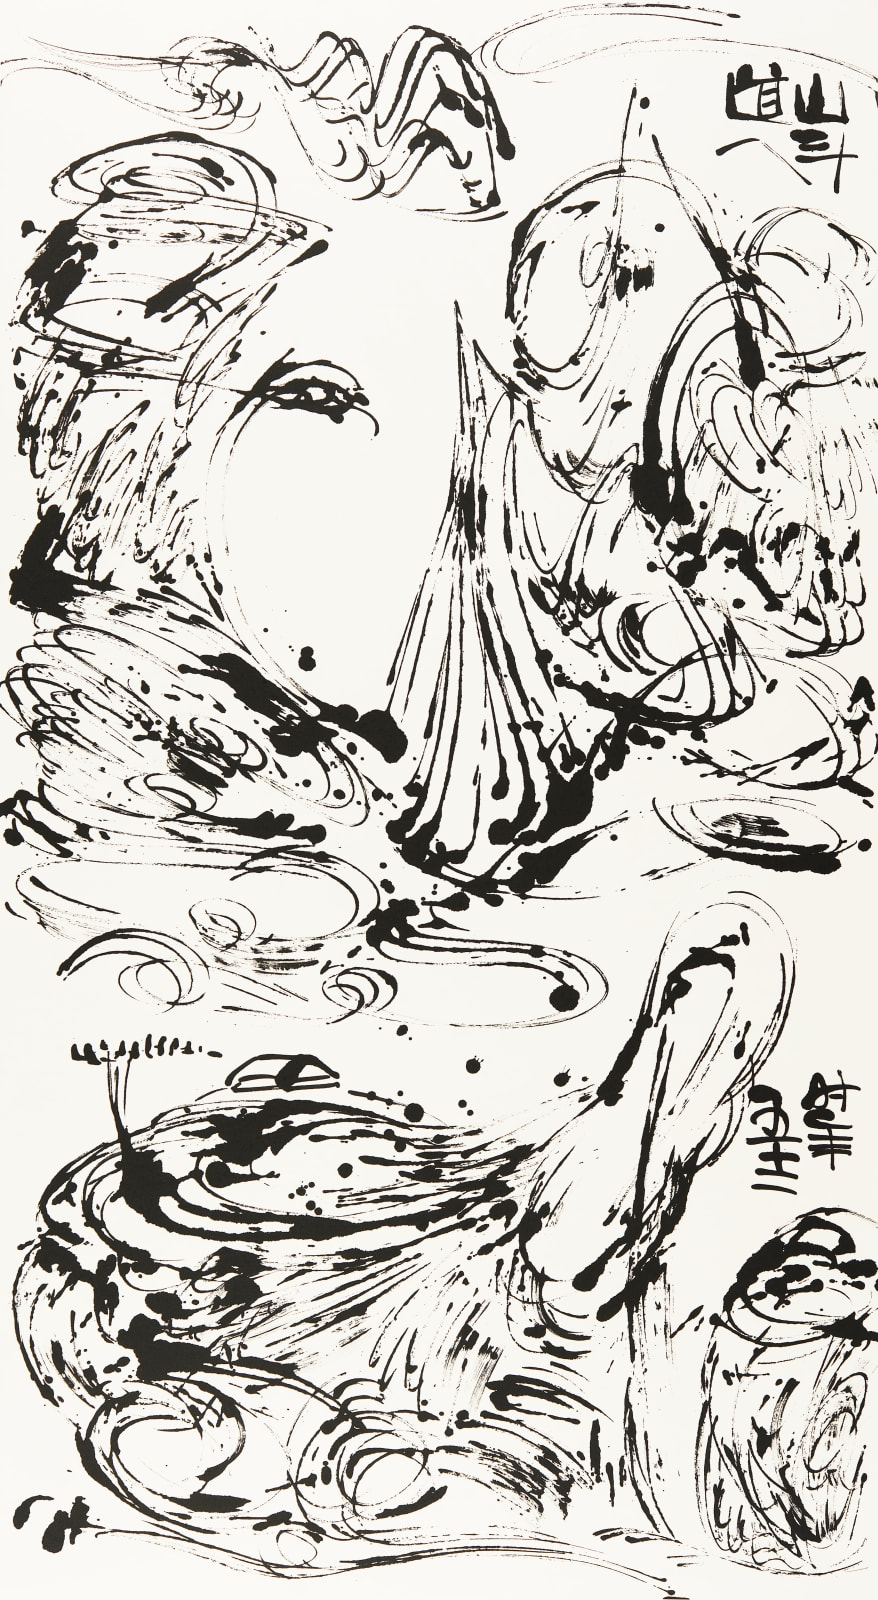 Wesley Tongson 唐家偉, Spiritual Mountains 靈山 No. 1145, 2009